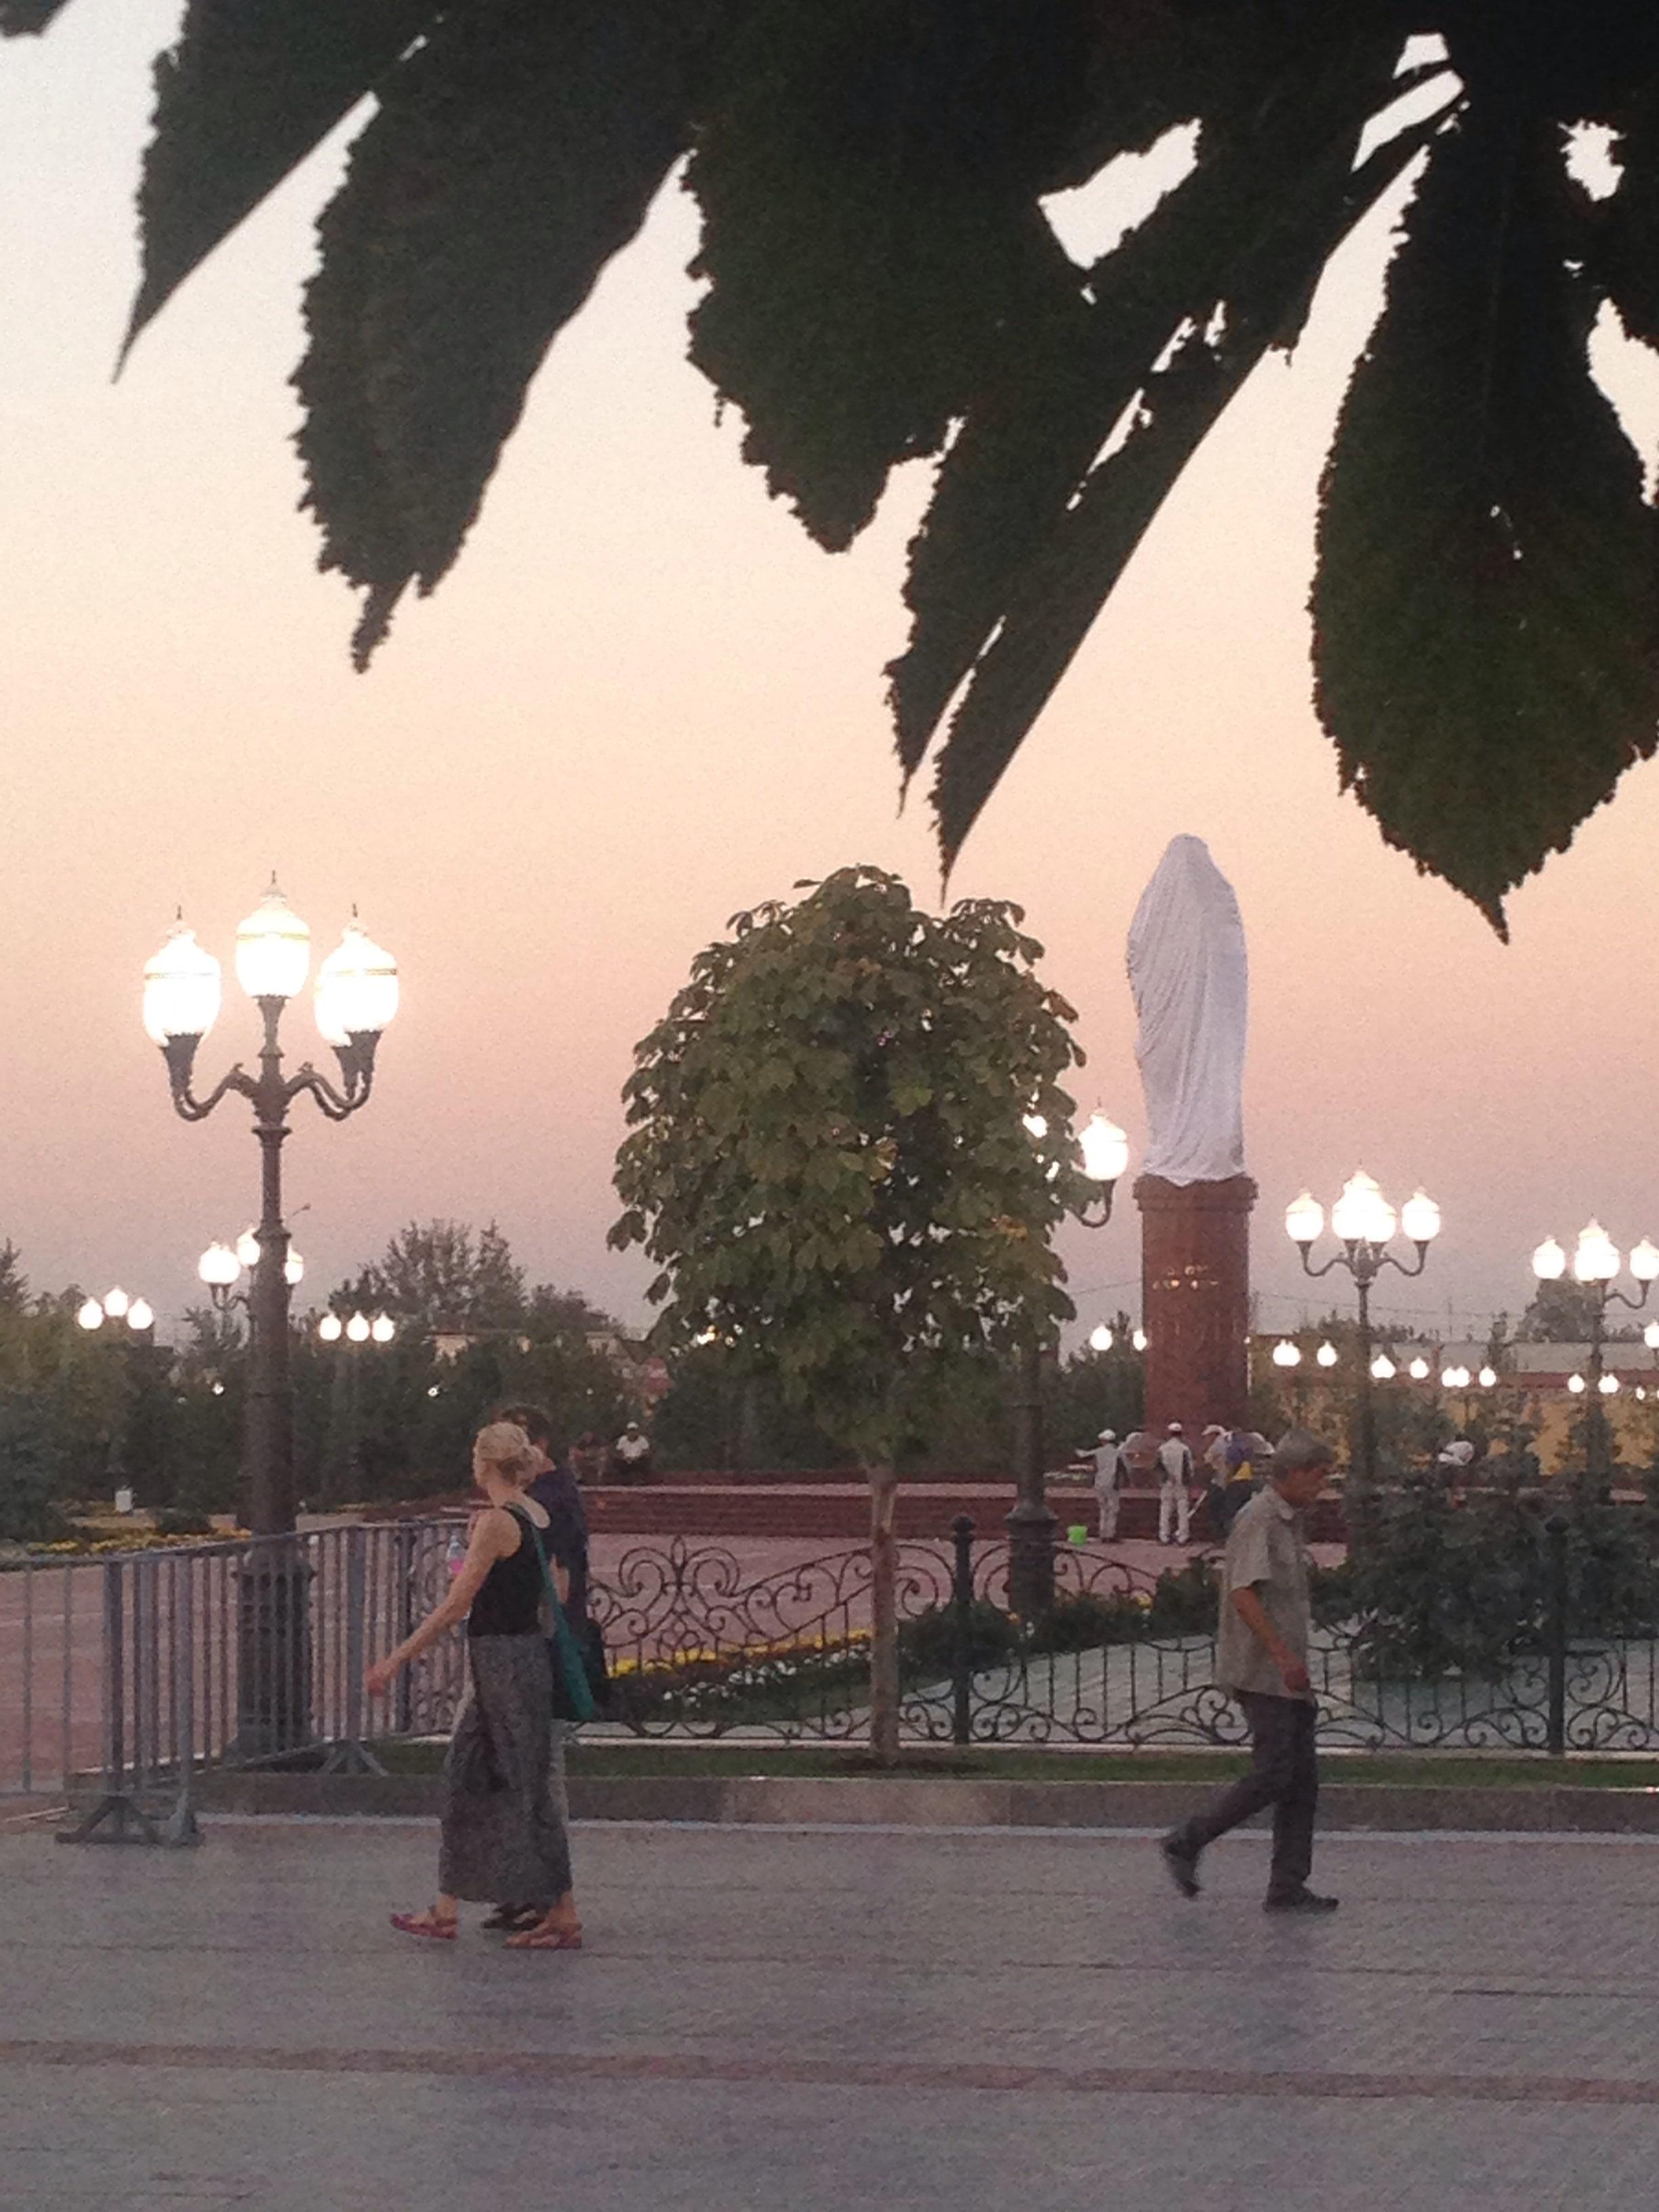 tachkent karimov statue